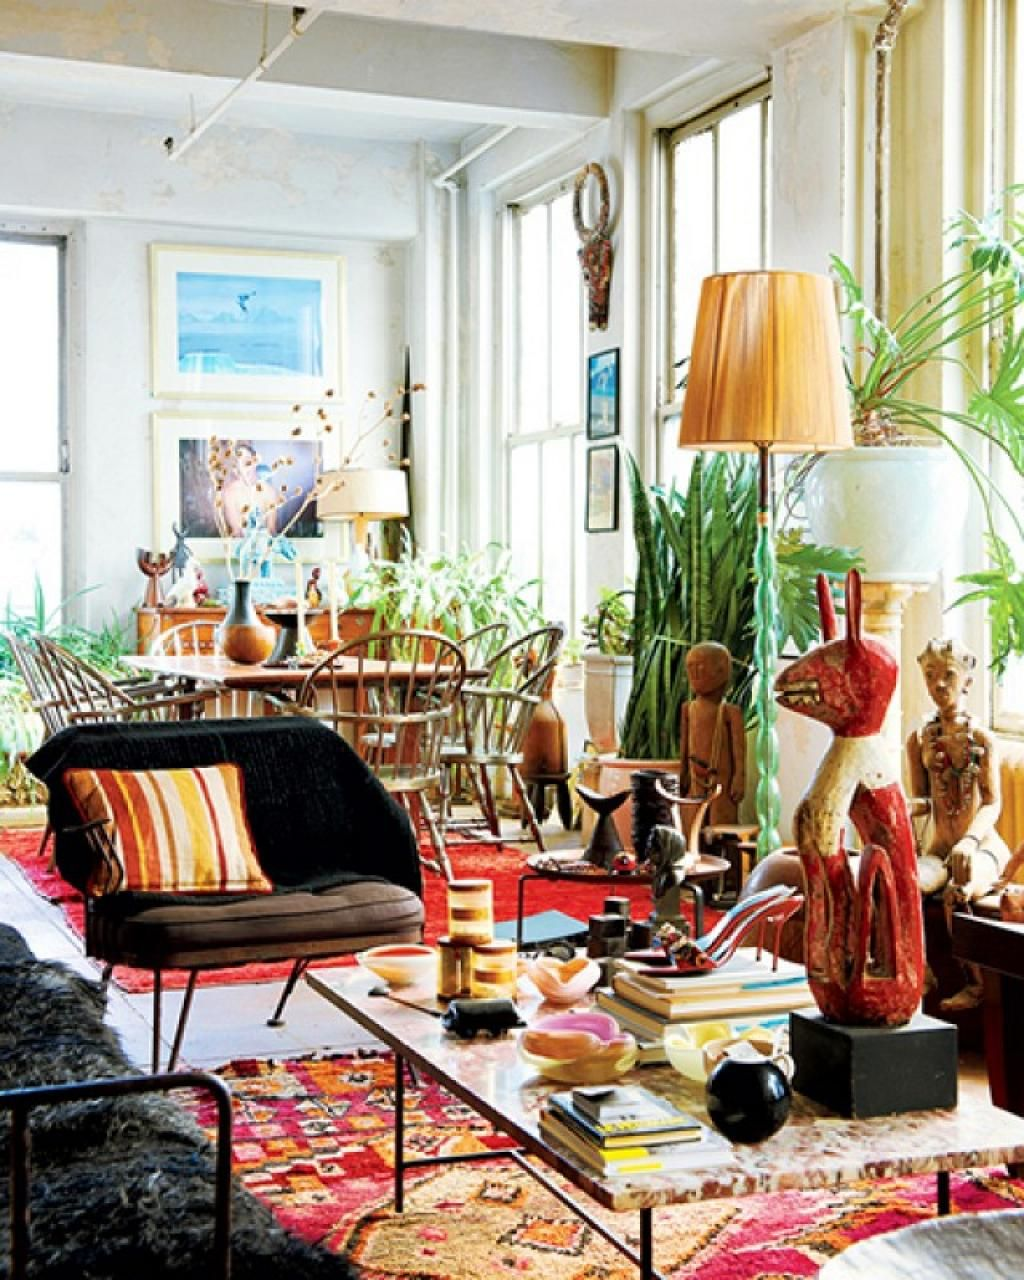 28 alluring contemporary mexican interior design ideas for alamos28 alluring contemporary mexican interior design ideas & Eclectic Mexican Decor Ideas | amazing home interior